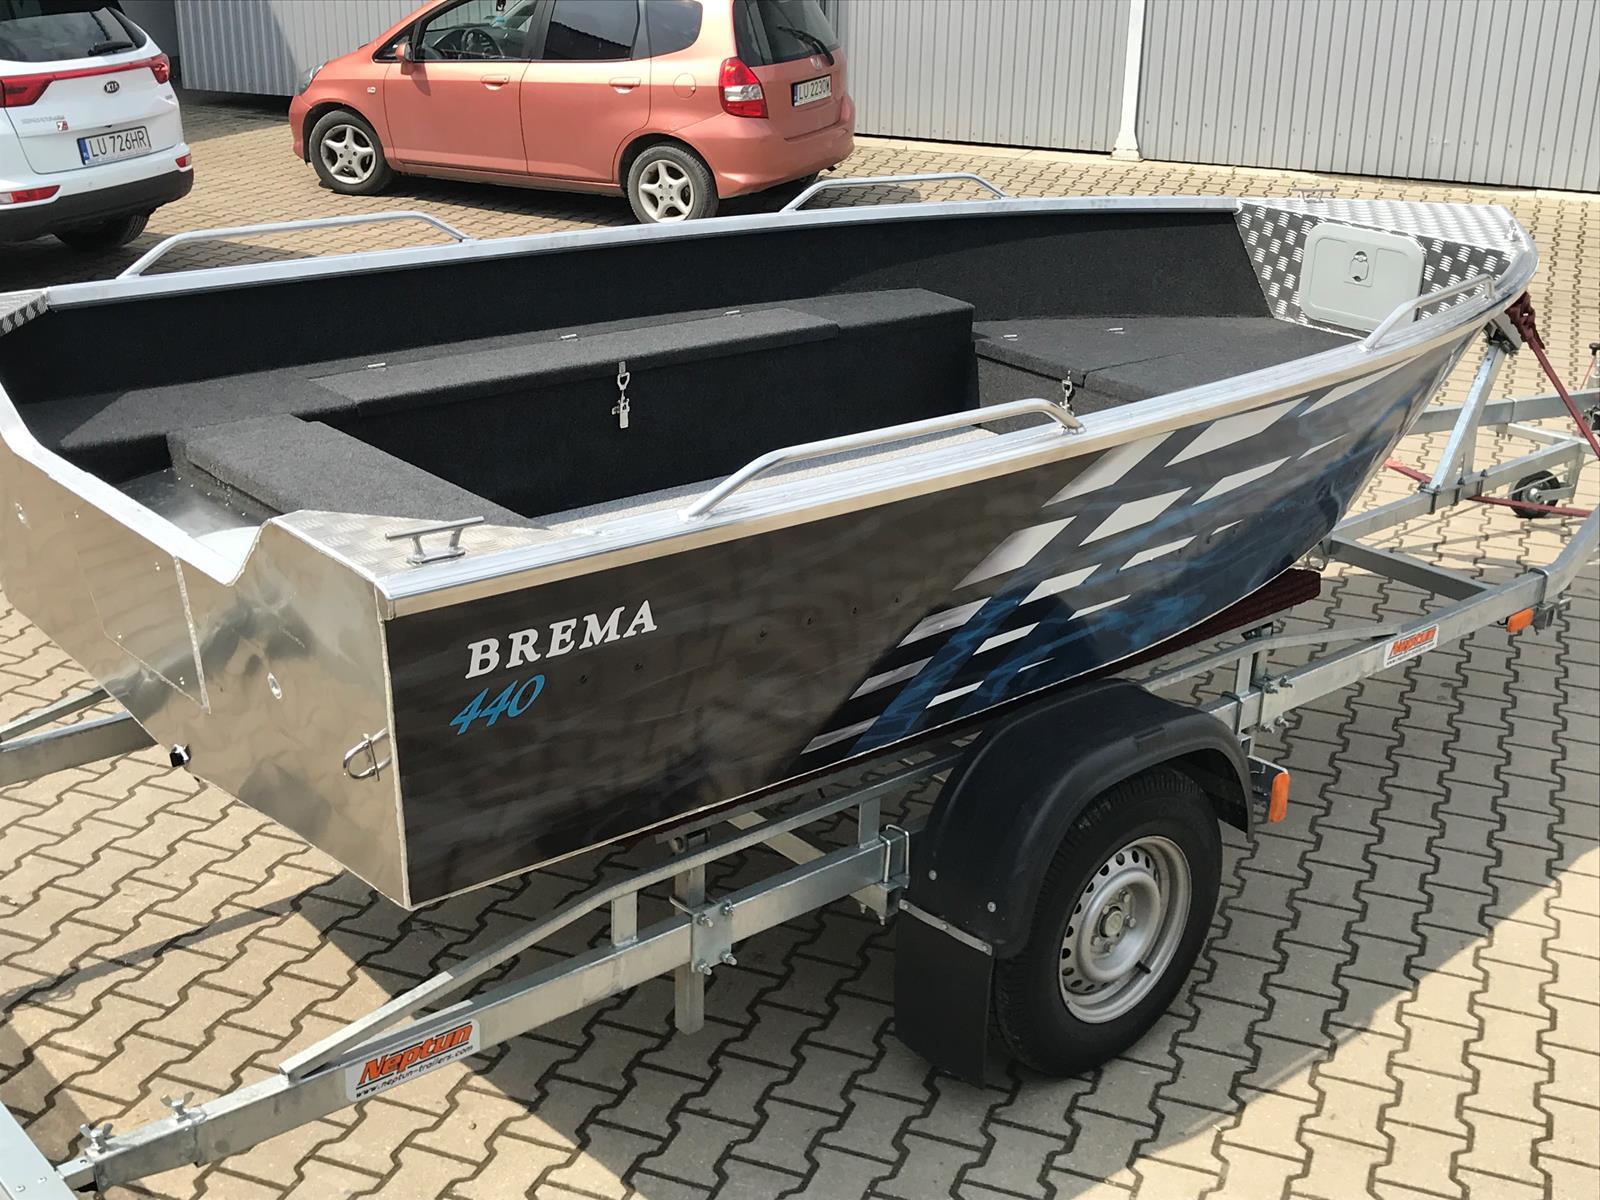 BremaBoats